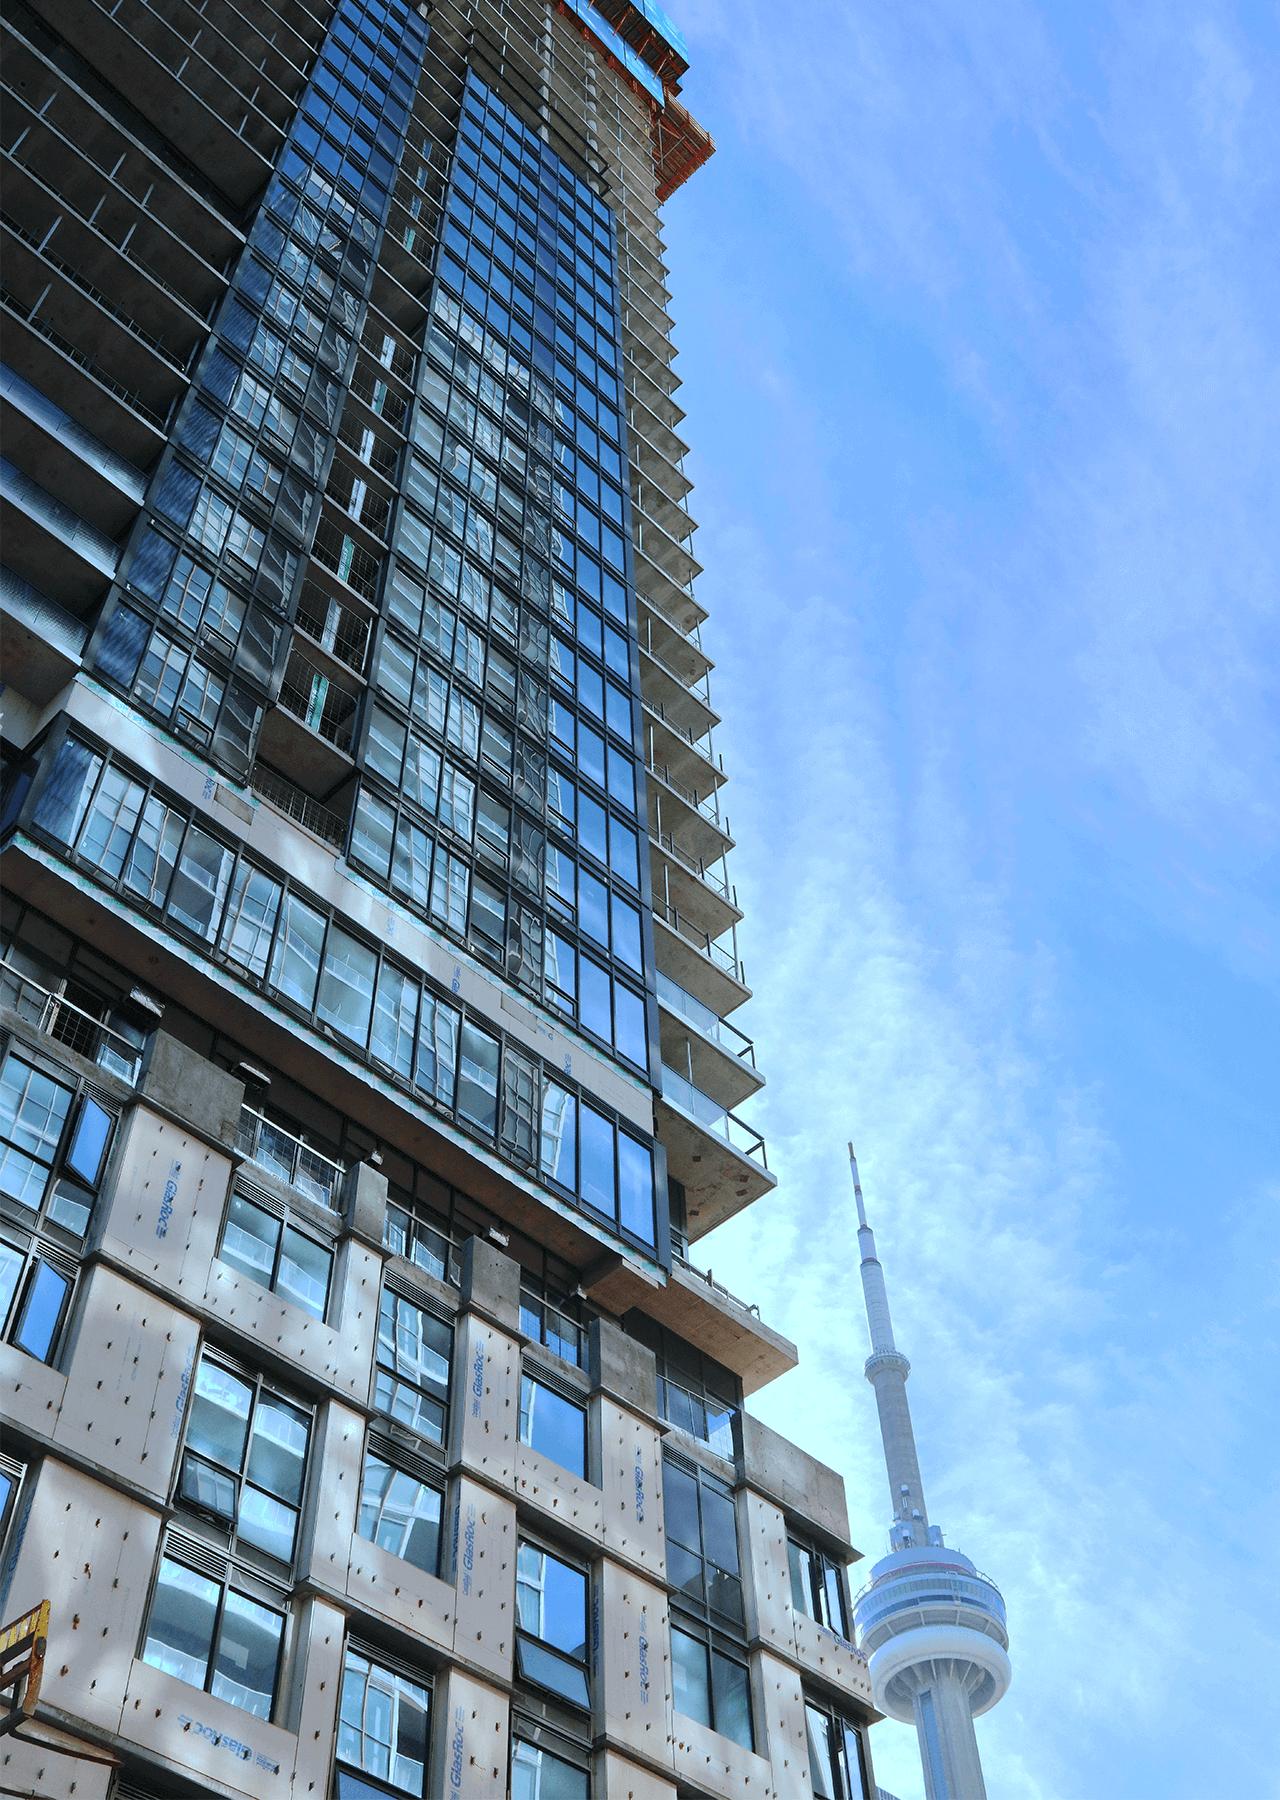 King Blue building